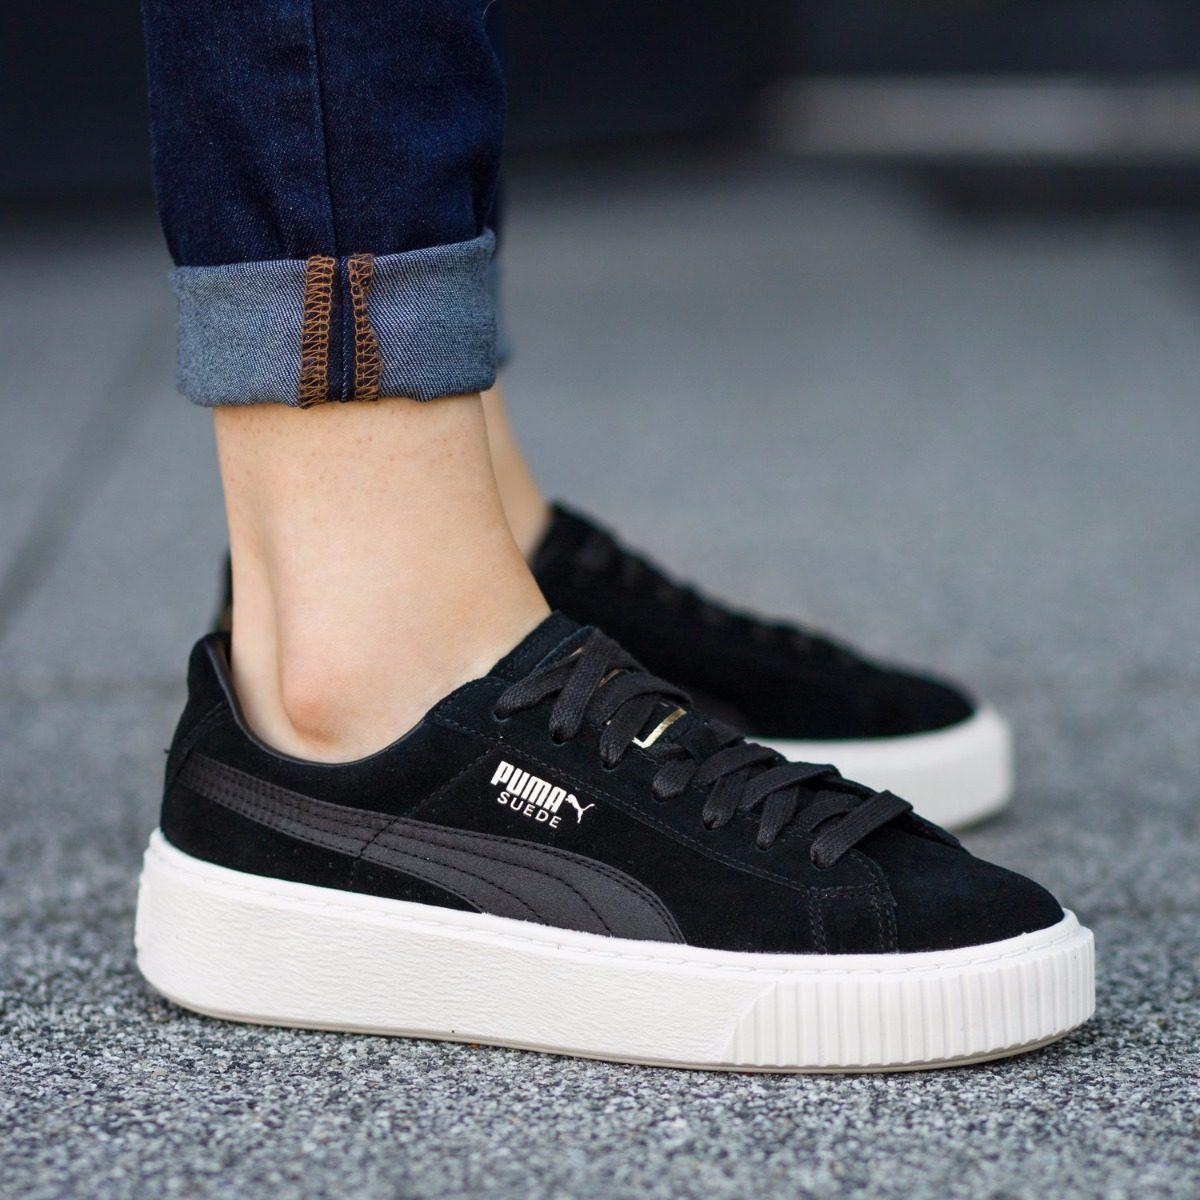 puma plataforma negra